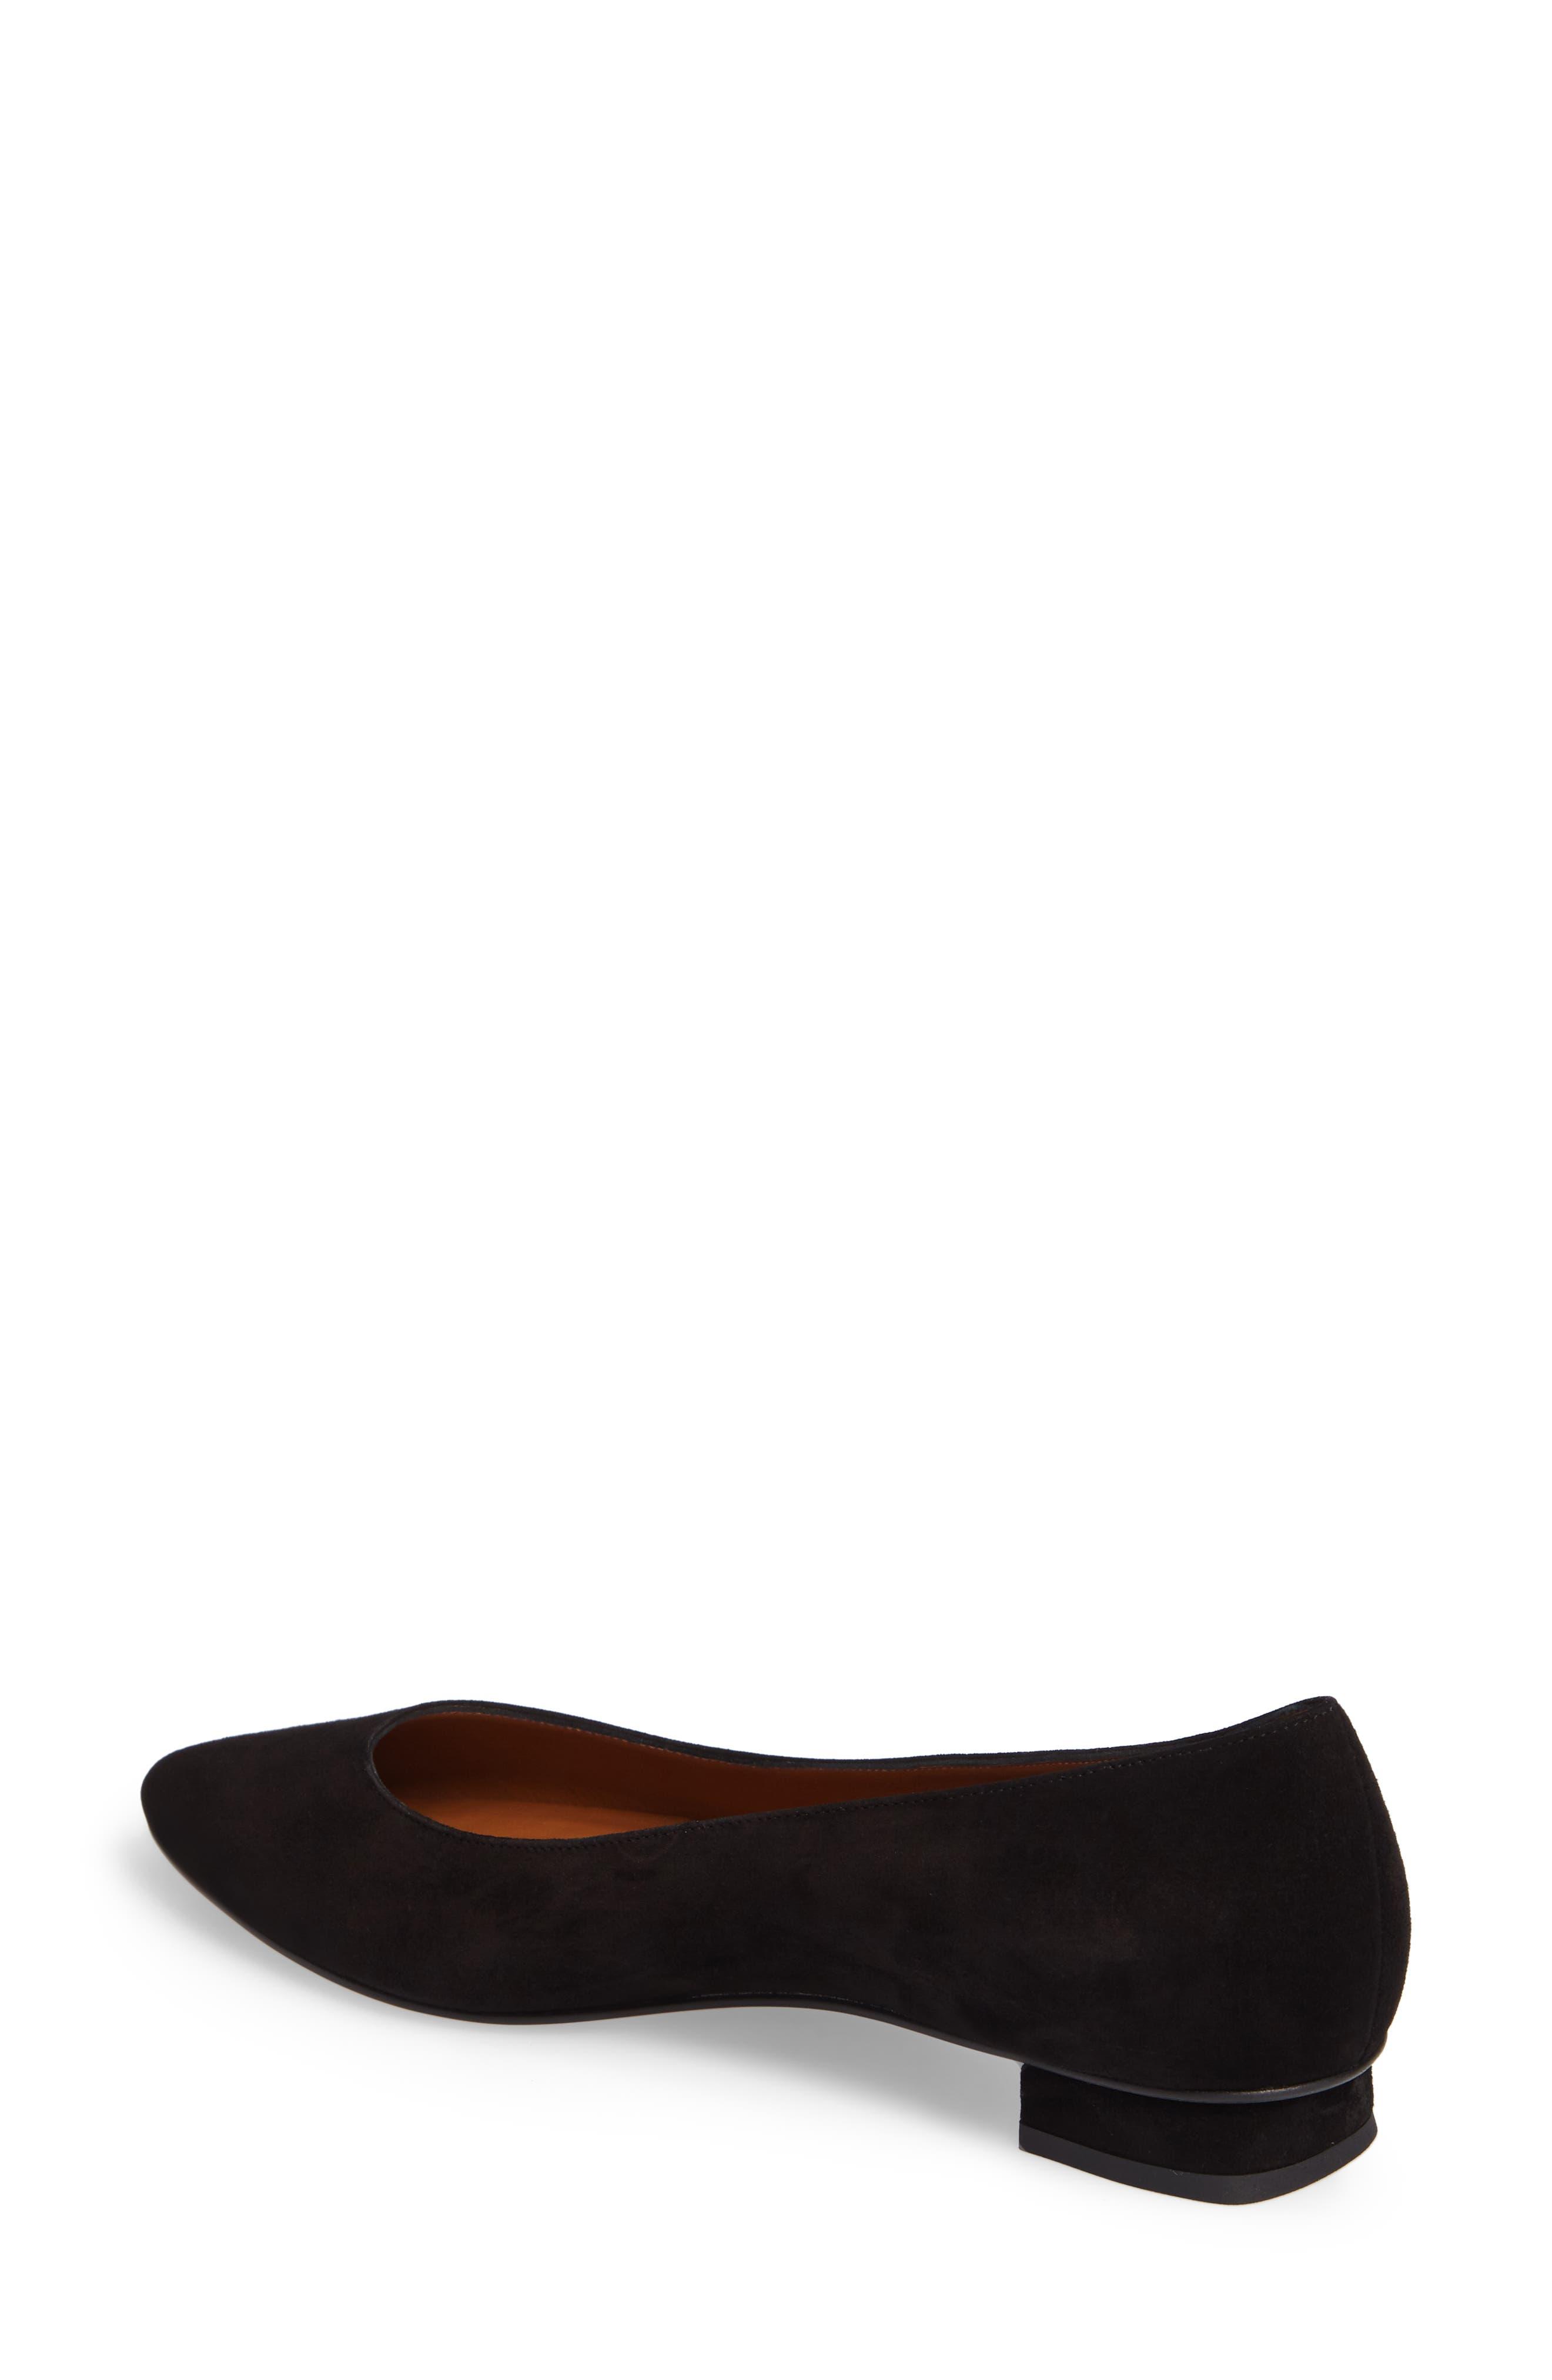 Perla Weatherproof Ballerina Shoe,                             Alternate thumbnail 2, color,                             Black Suede